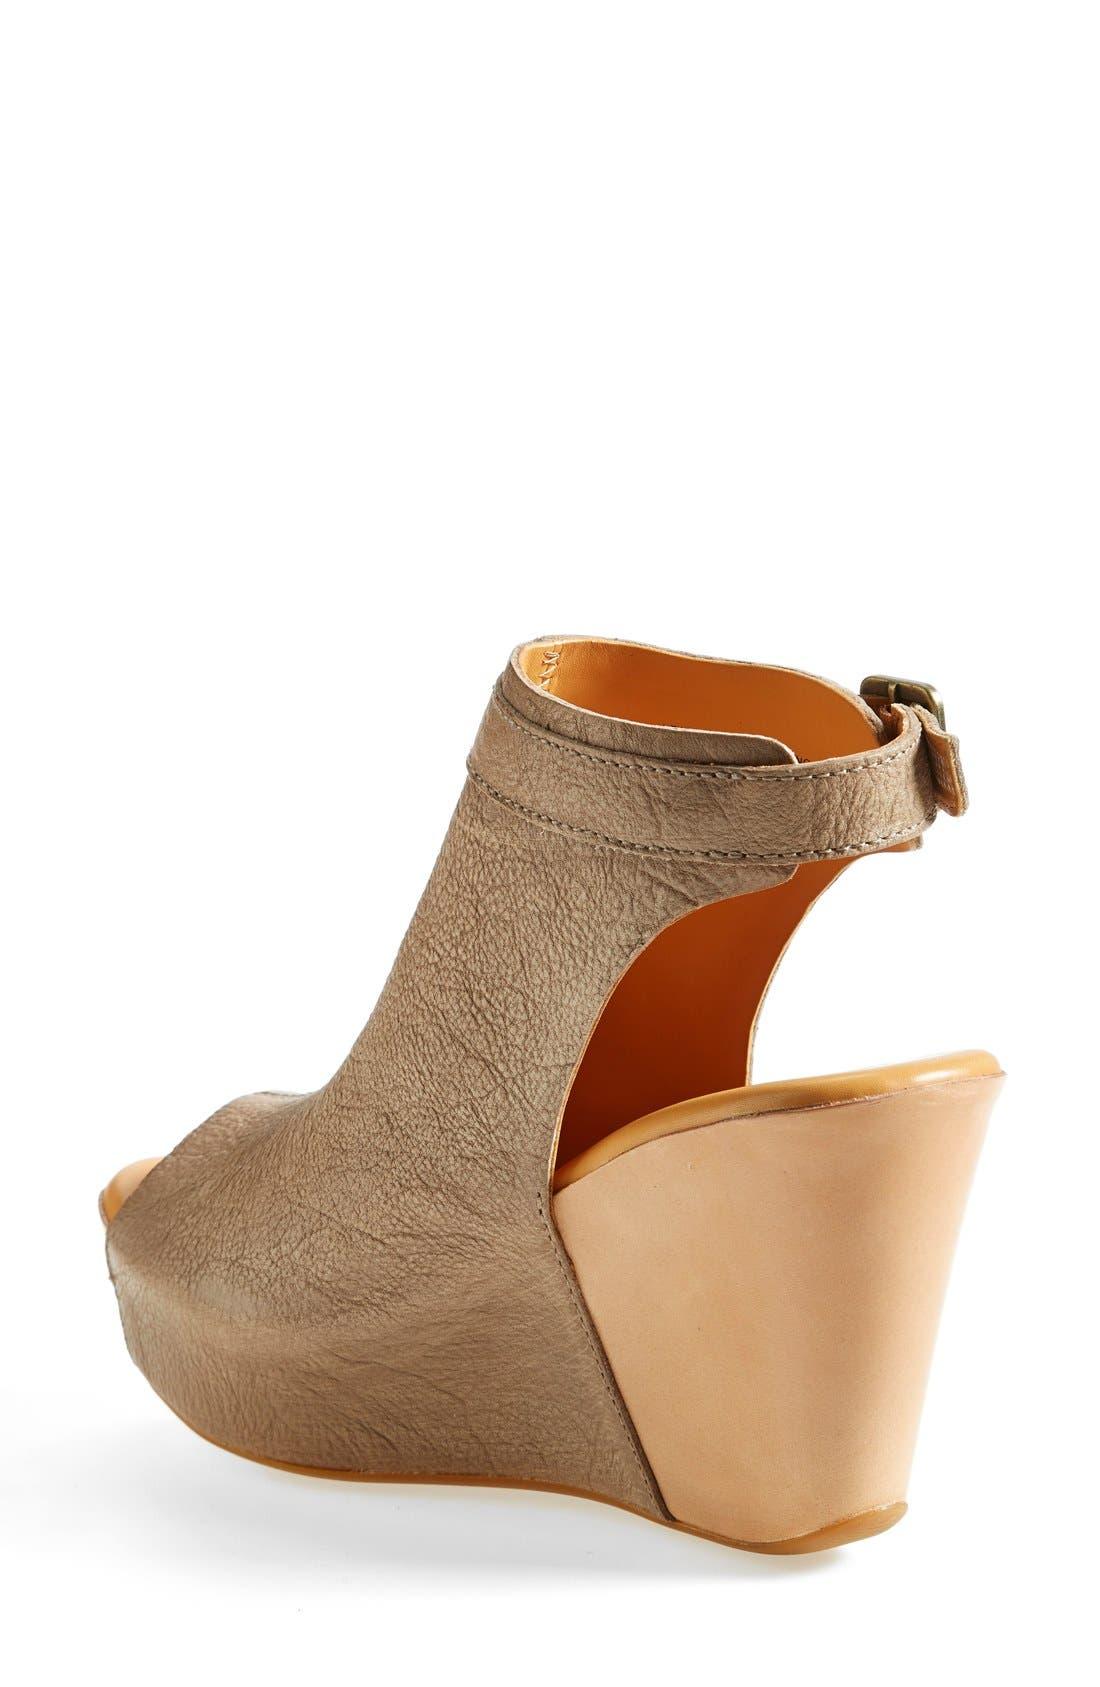 'Berit' Wedge Sandal,                             Alternate thumbnail 34, color,